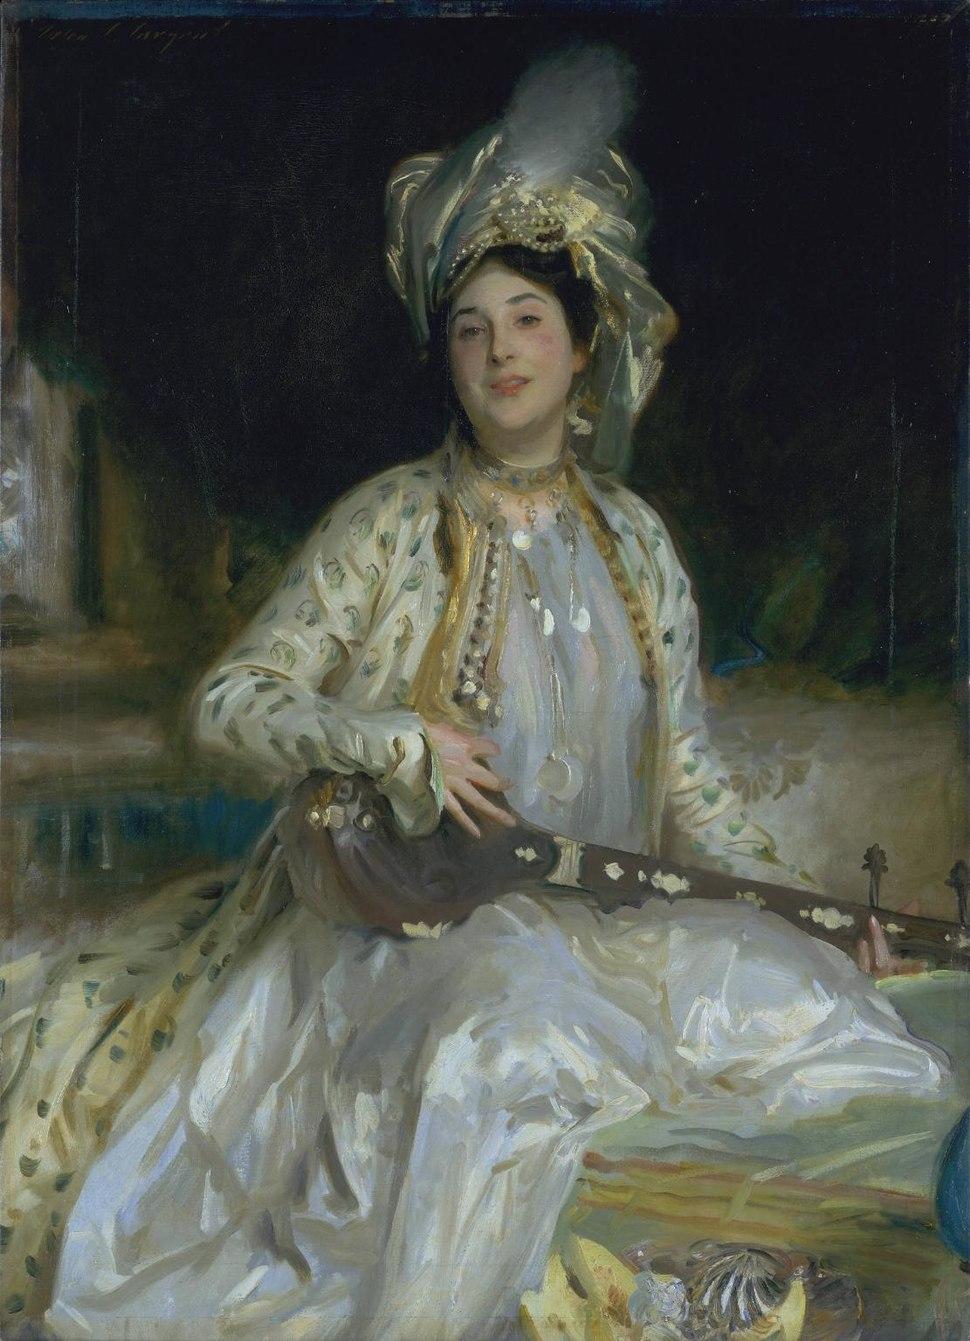 Almina Daughter of Asher Wertheimer by J S Sargent